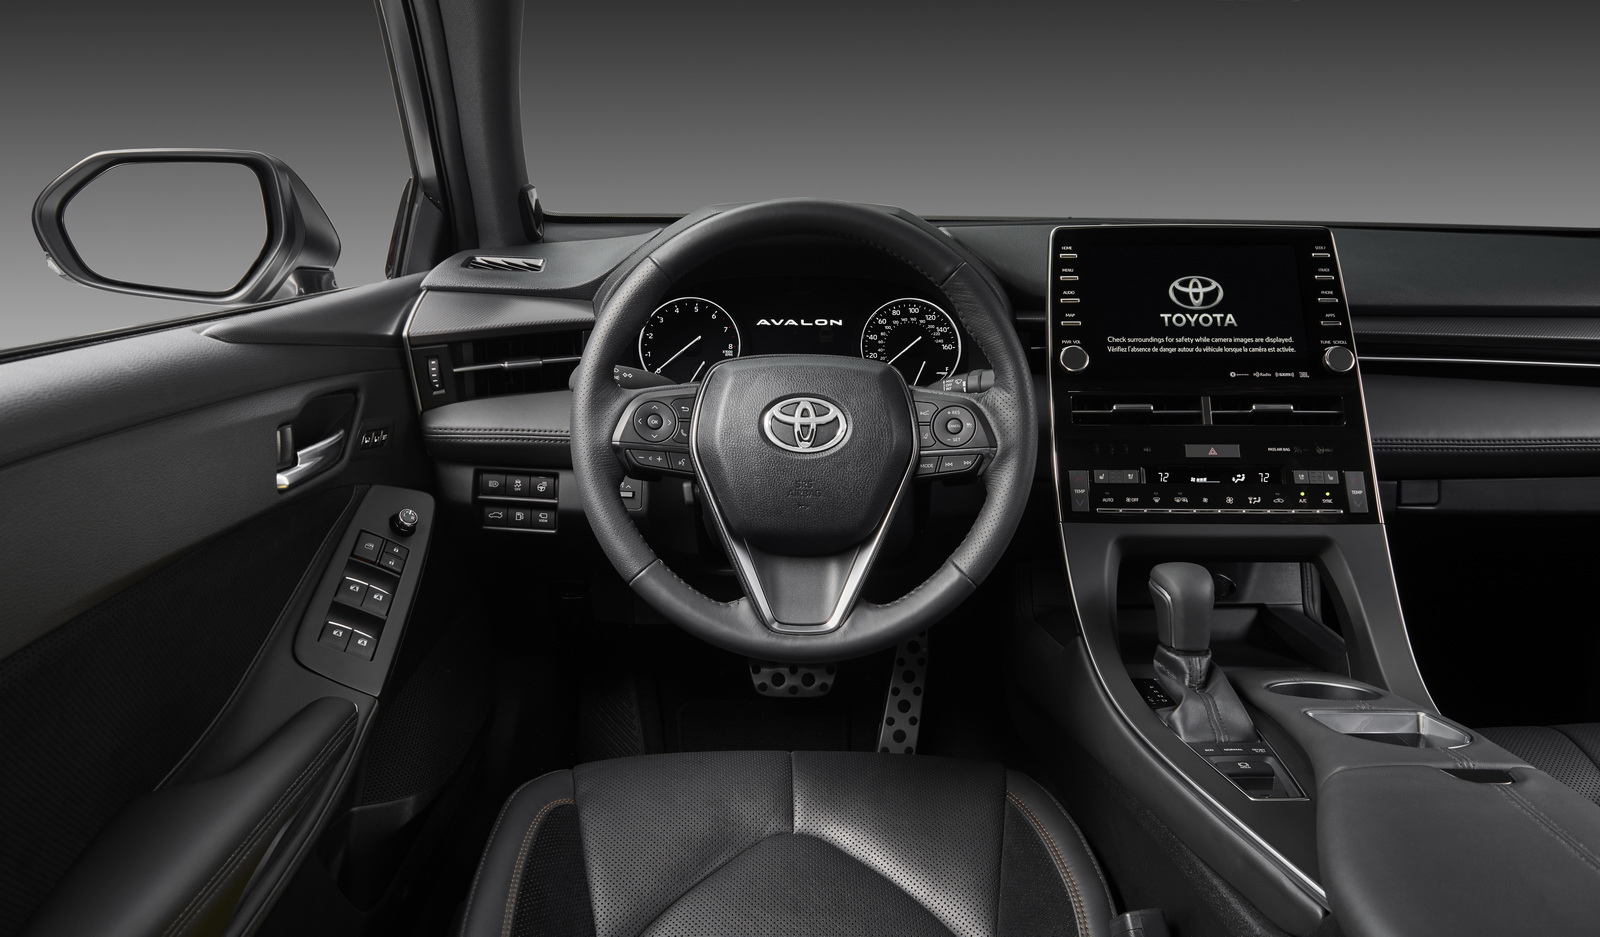 Toyota Avalon 2019 (52)